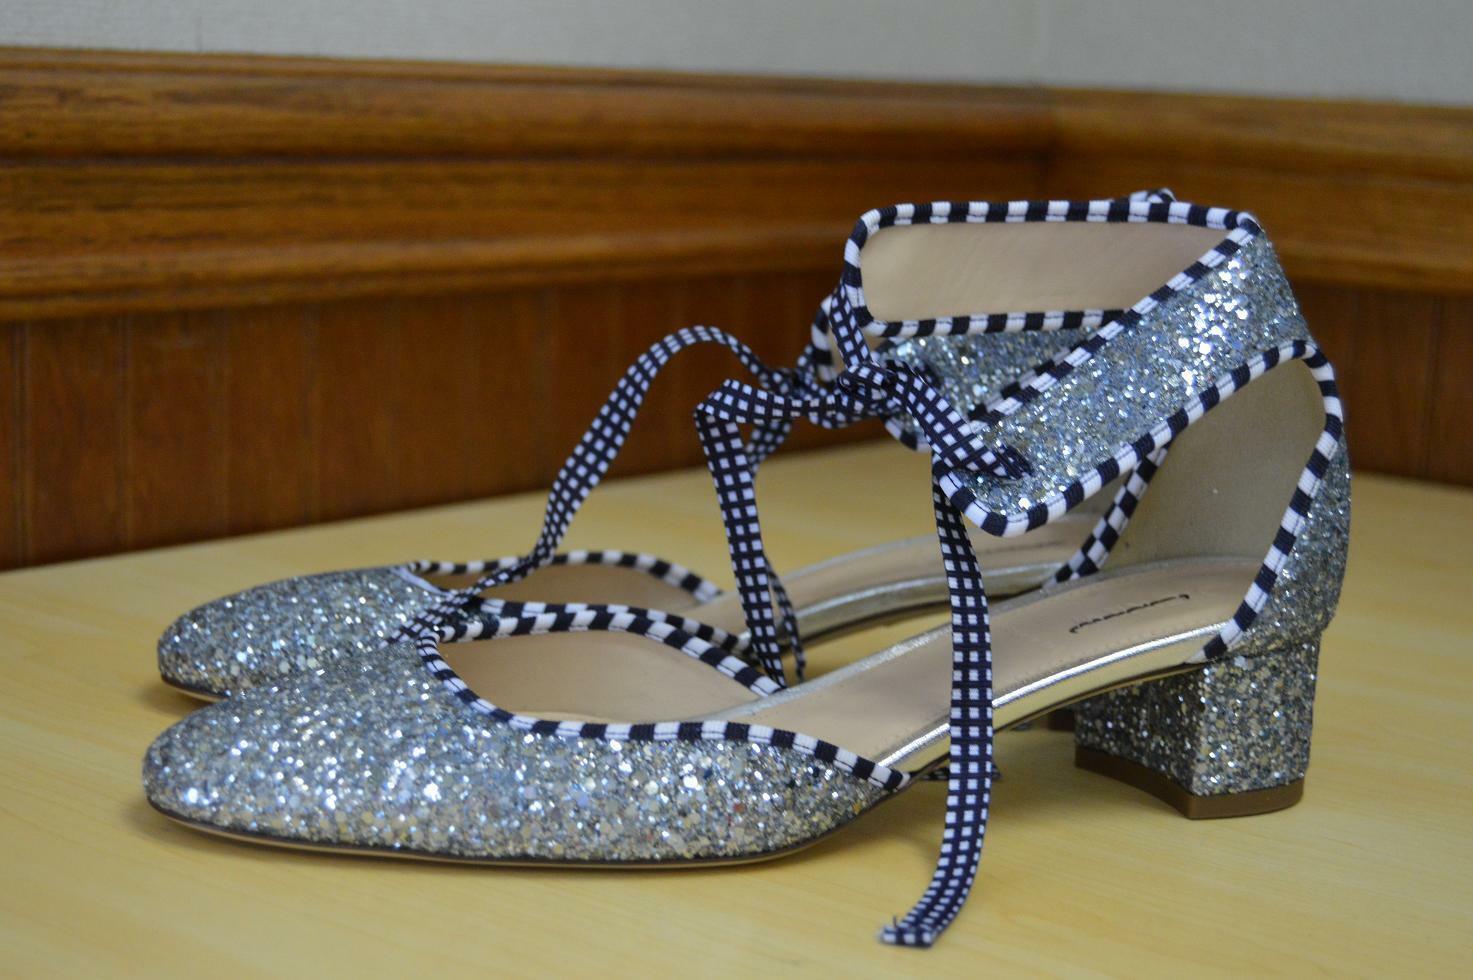 J.Crew  238 Glitter Ankle Tiolo Heels 8.5 Scarpe argento Block New Sparkle G0931